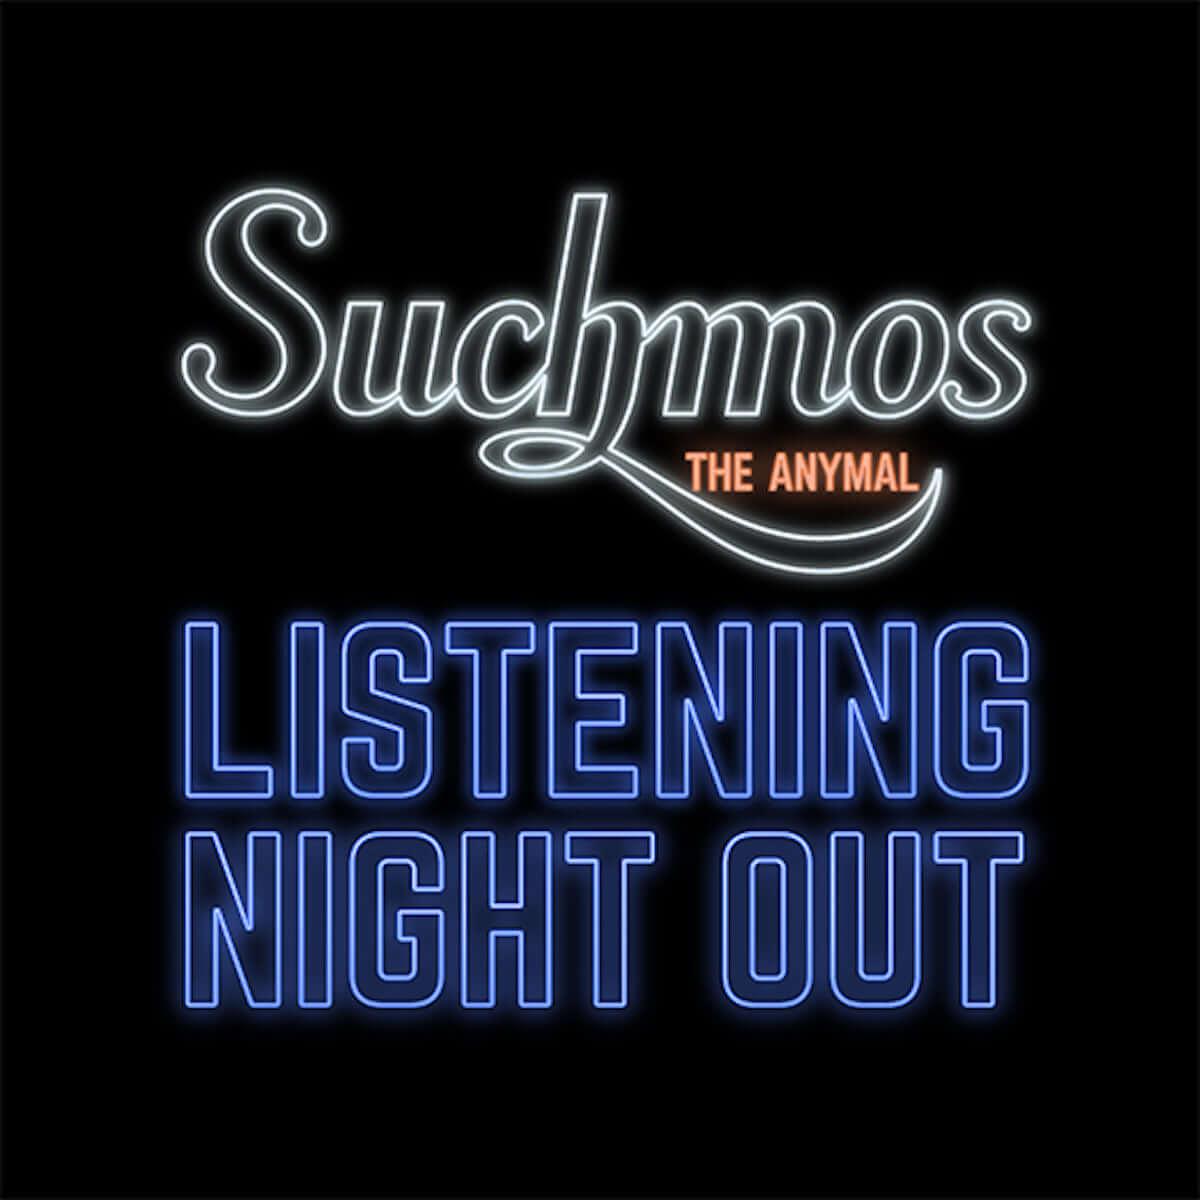 Suchmos、ニューアルバム『THE ANYMAL』の先行全曲試聴会を全国で一斉開催 music190227_suchmos_1-1200x1200